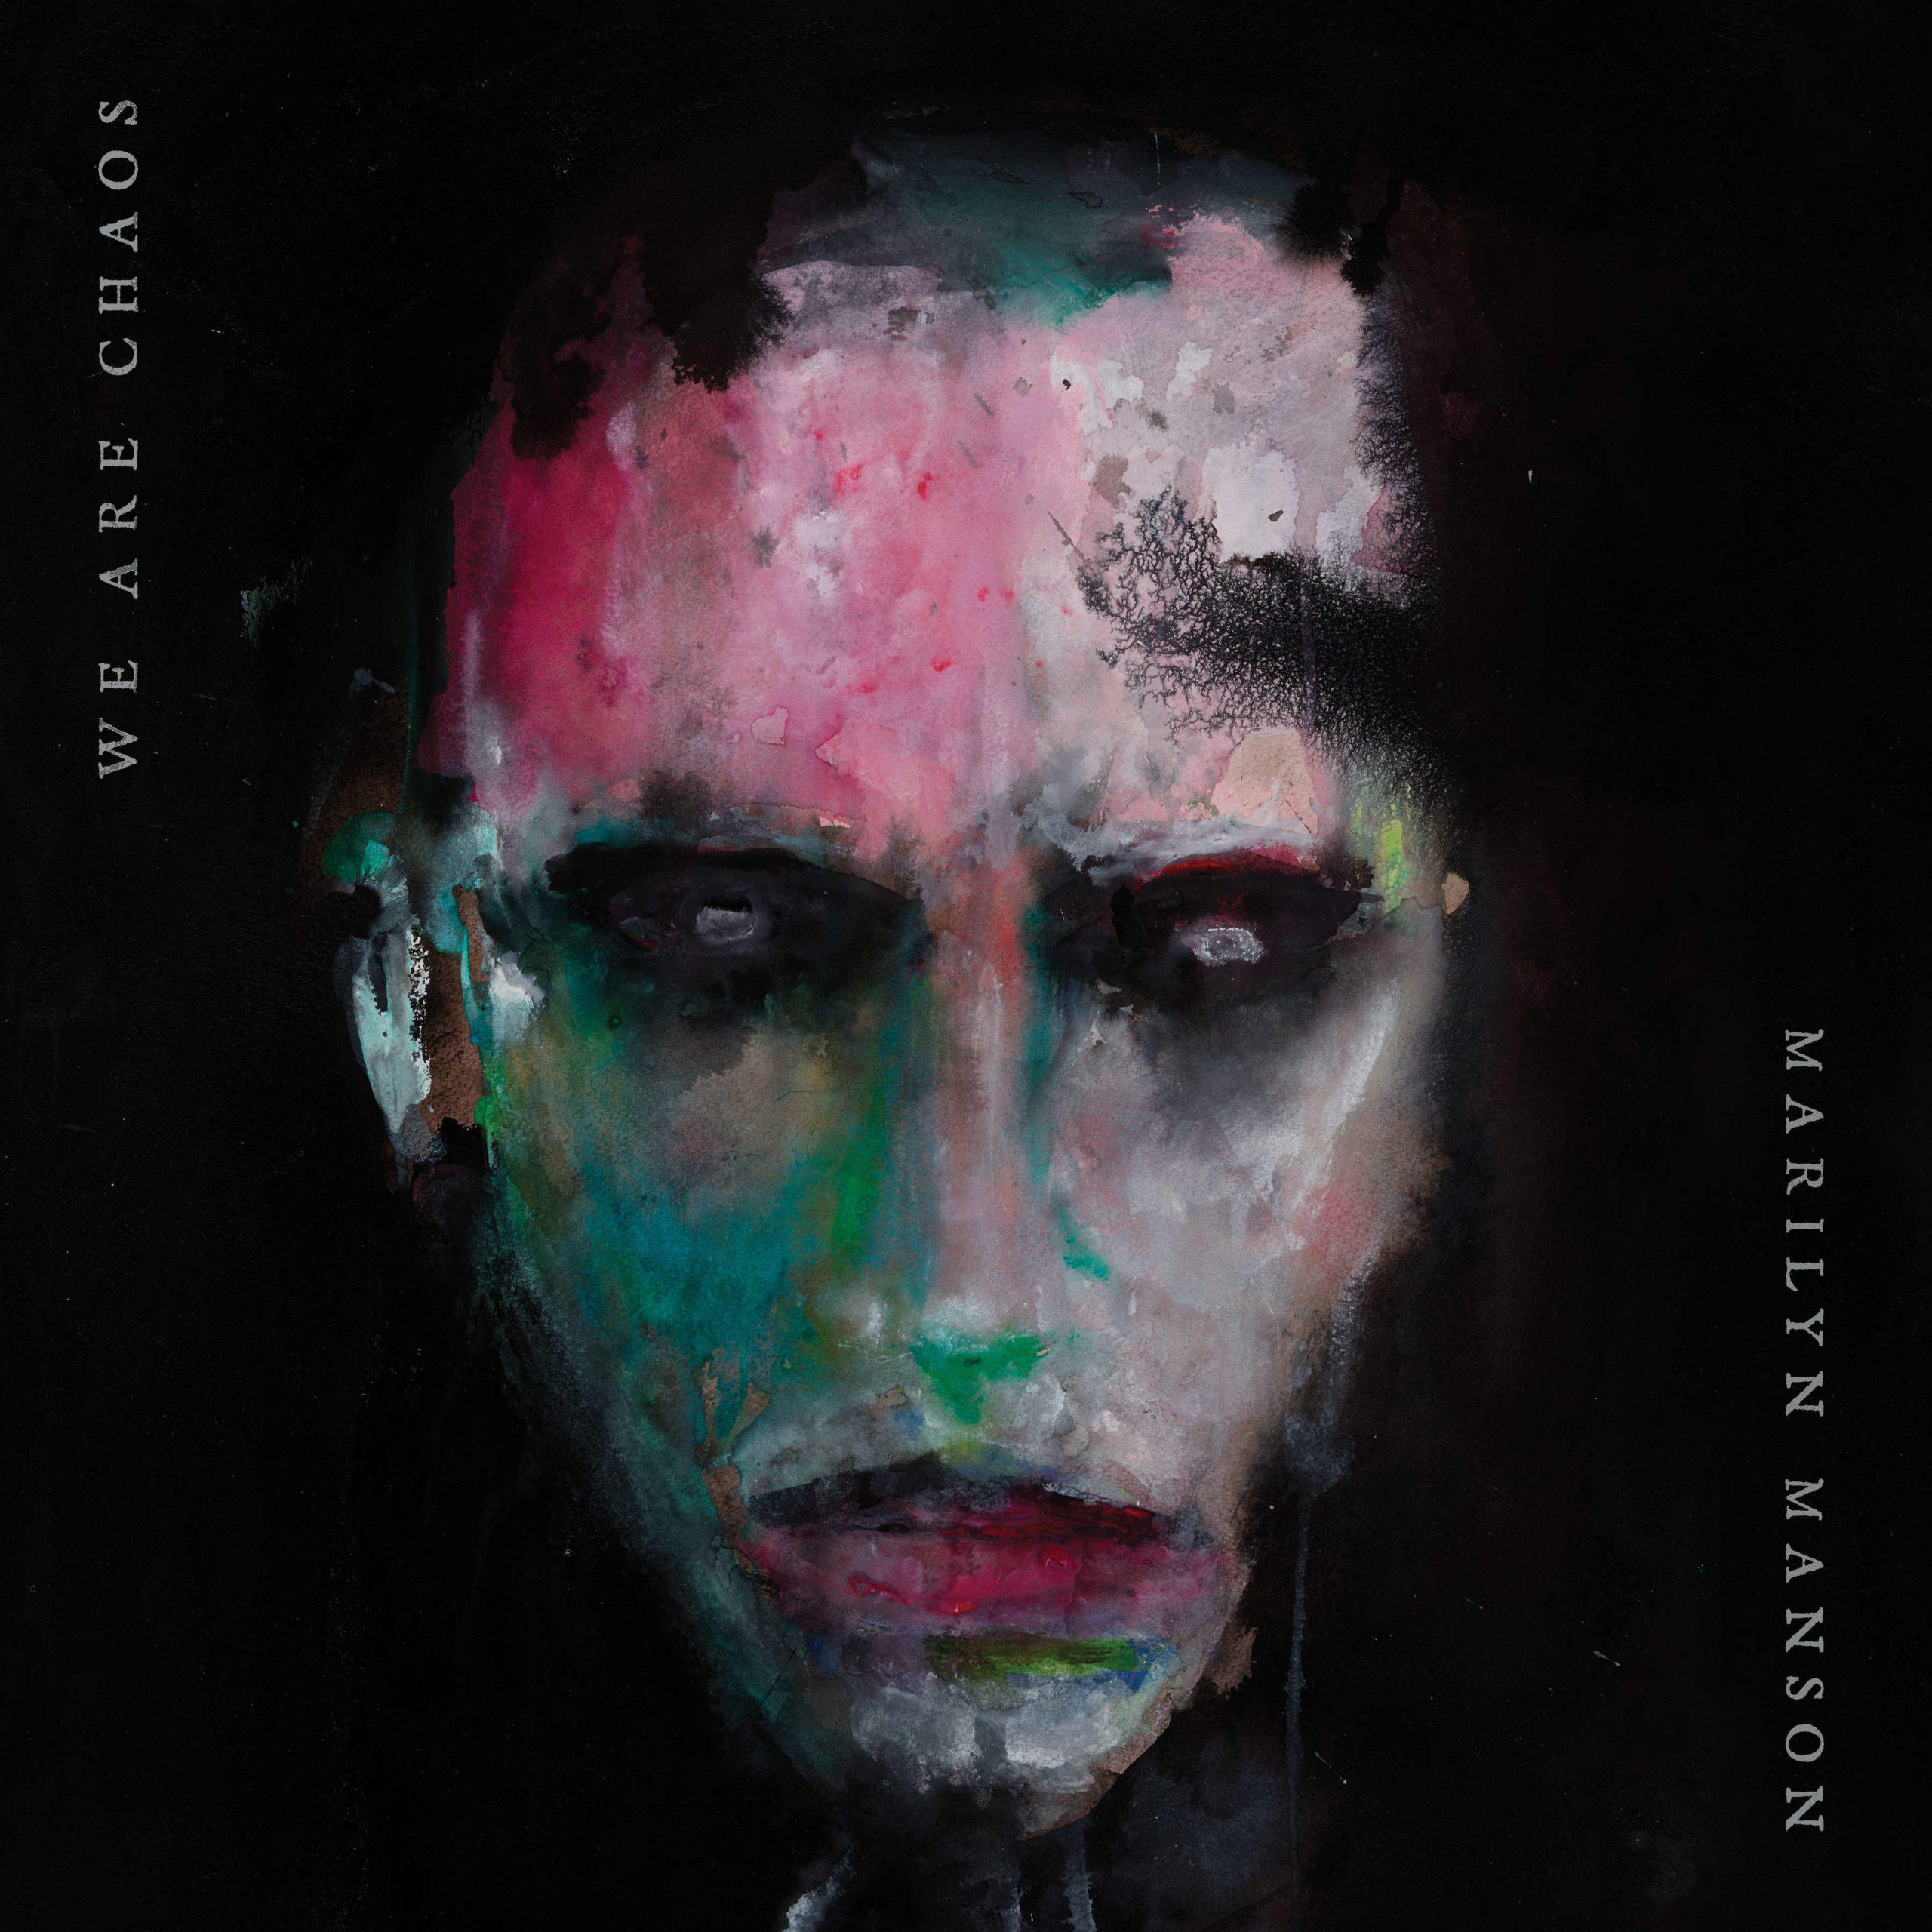 Best Art Vinyl Awards 2020 Marilyn Manson